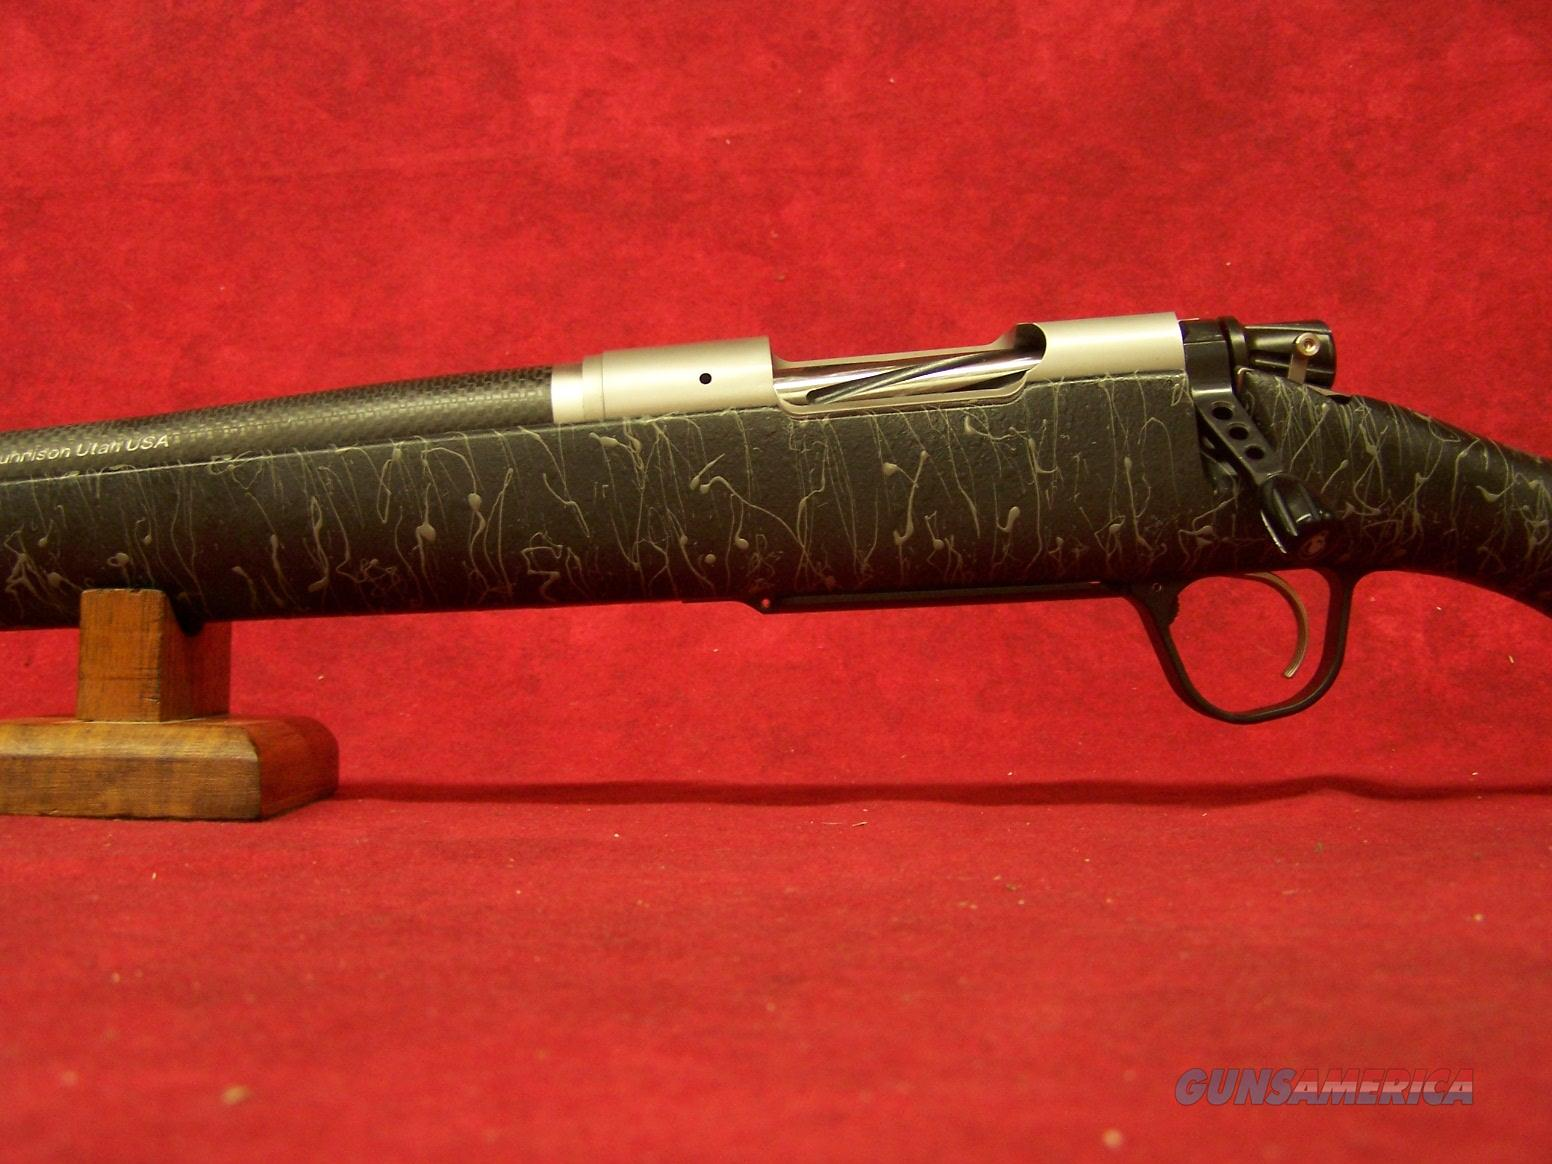 "Christensen Arms Ridgeline Left Hand 6.5 Creedmoor 24"" Barrel 1:8 Tier 2 Black w/gray webbing stock  Guns > Rifles > C Misc Rifles"